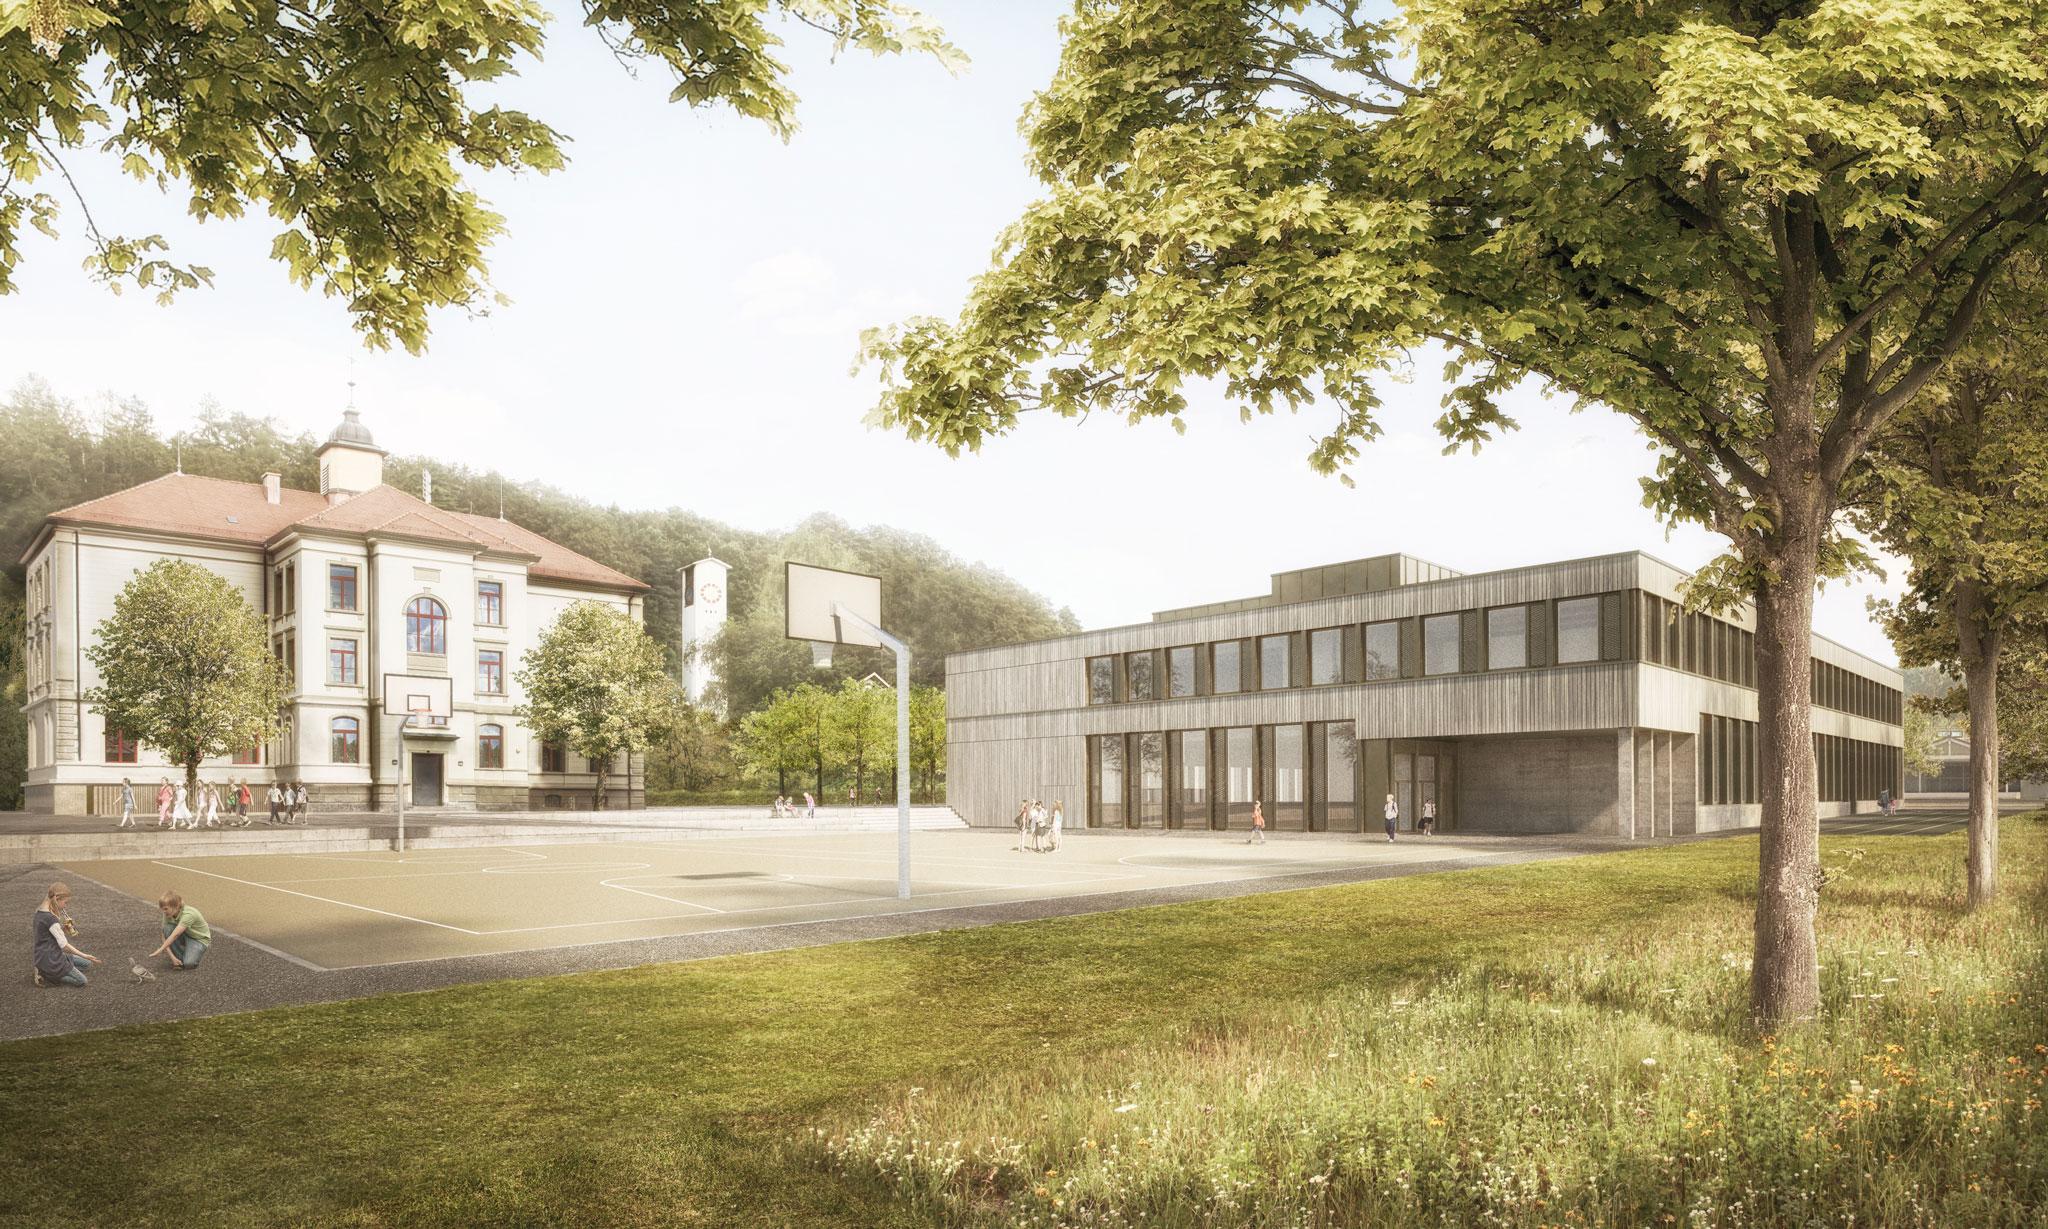 673_06_16.490-Stoos-Architekten-AG-SchulhausKindergarten-EXT1C-160912a